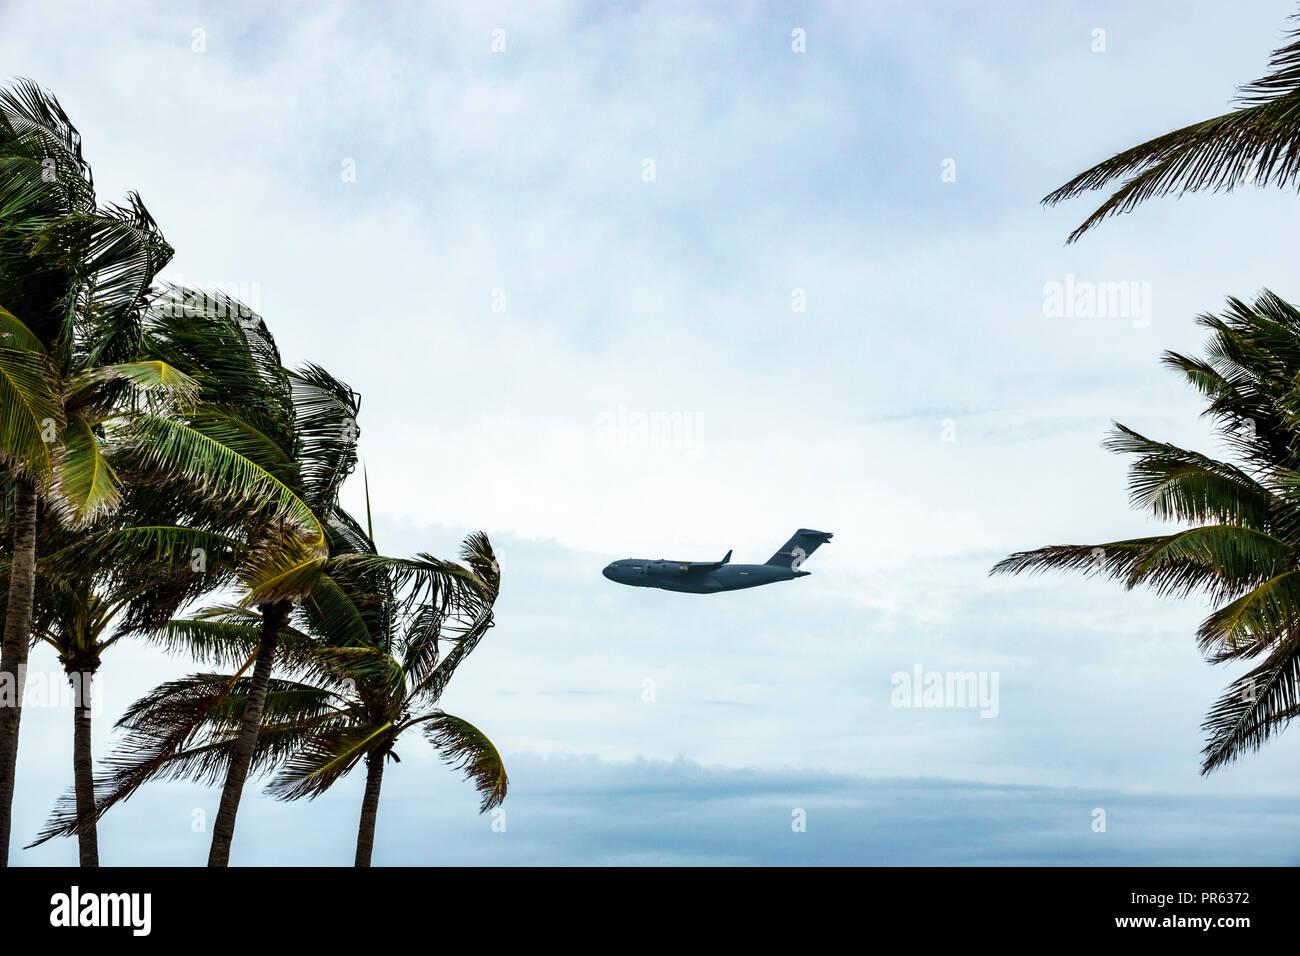 Miami Beach Florida National Salute to America's Heroes Air & Sea Show military transport aircraft Boeing C-17 Globemaster III - Stock Image